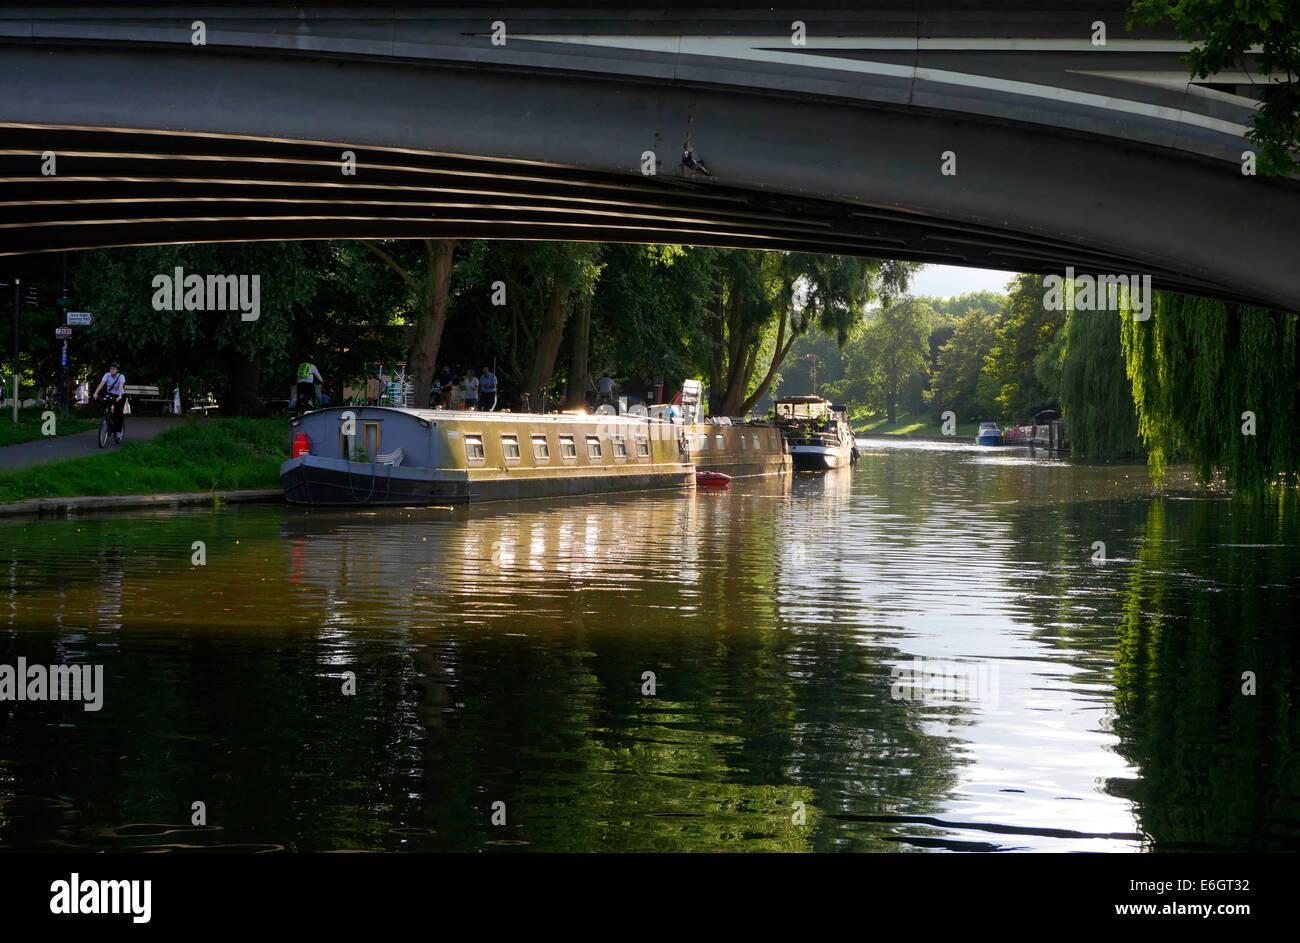 View of the River Cam from Victoria Avenue Bridge, Cambridge England - Stock Image